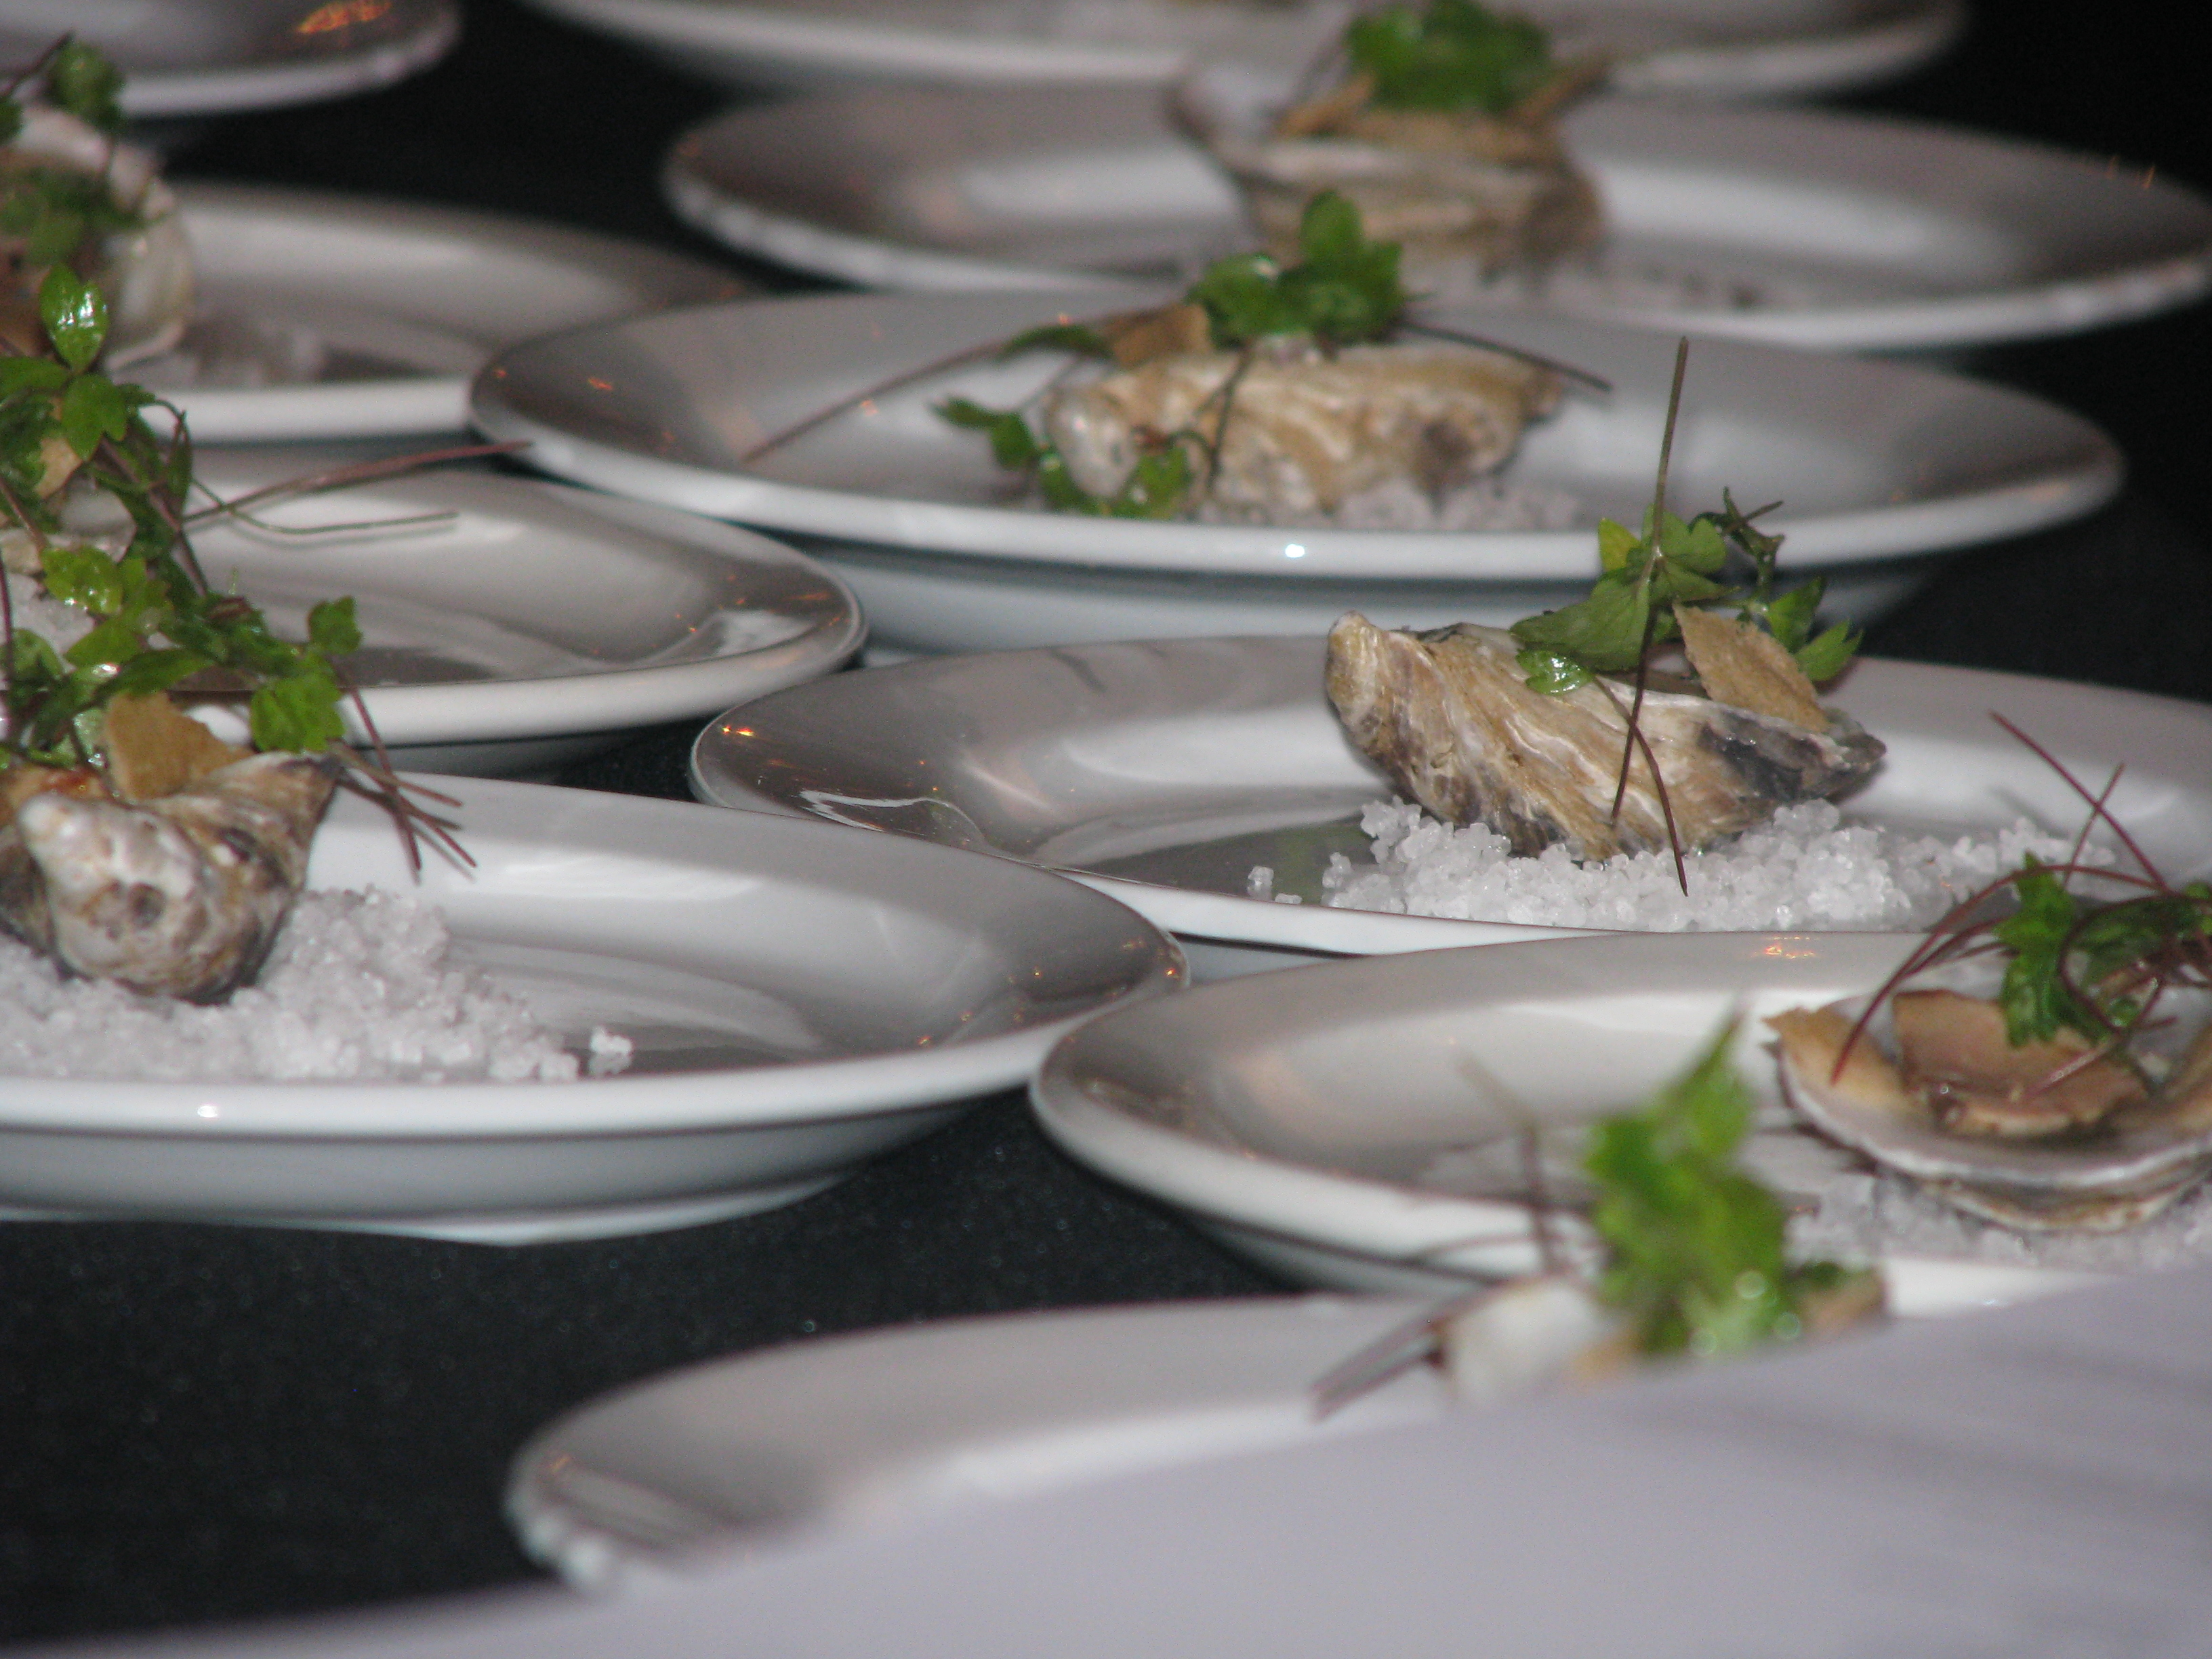 Mike Poliquin – Gastronomic – Ottawa